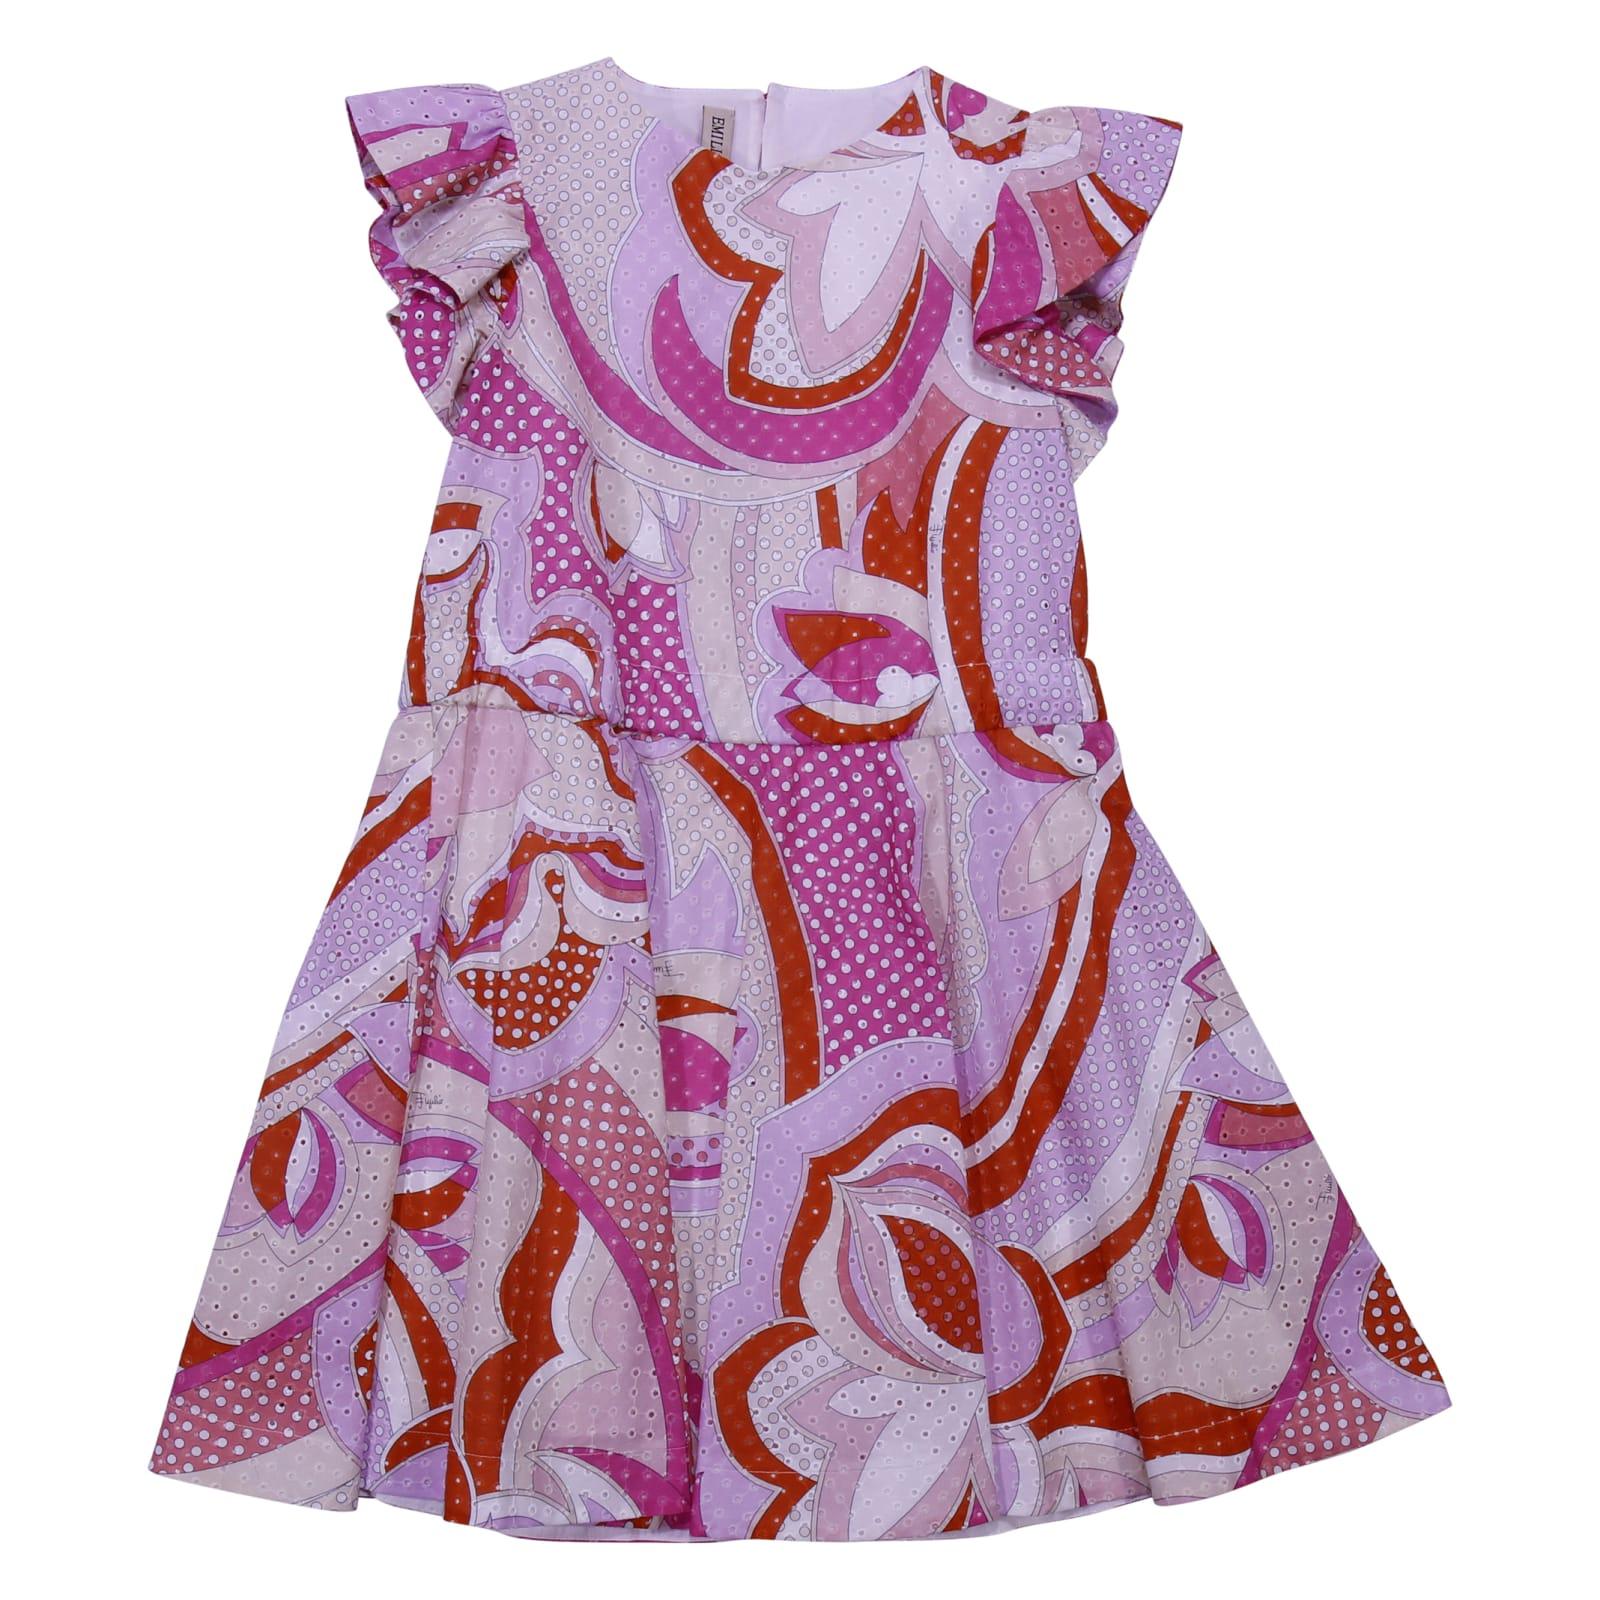 Emilio Pucci Printed Eyelet Cotton Dress